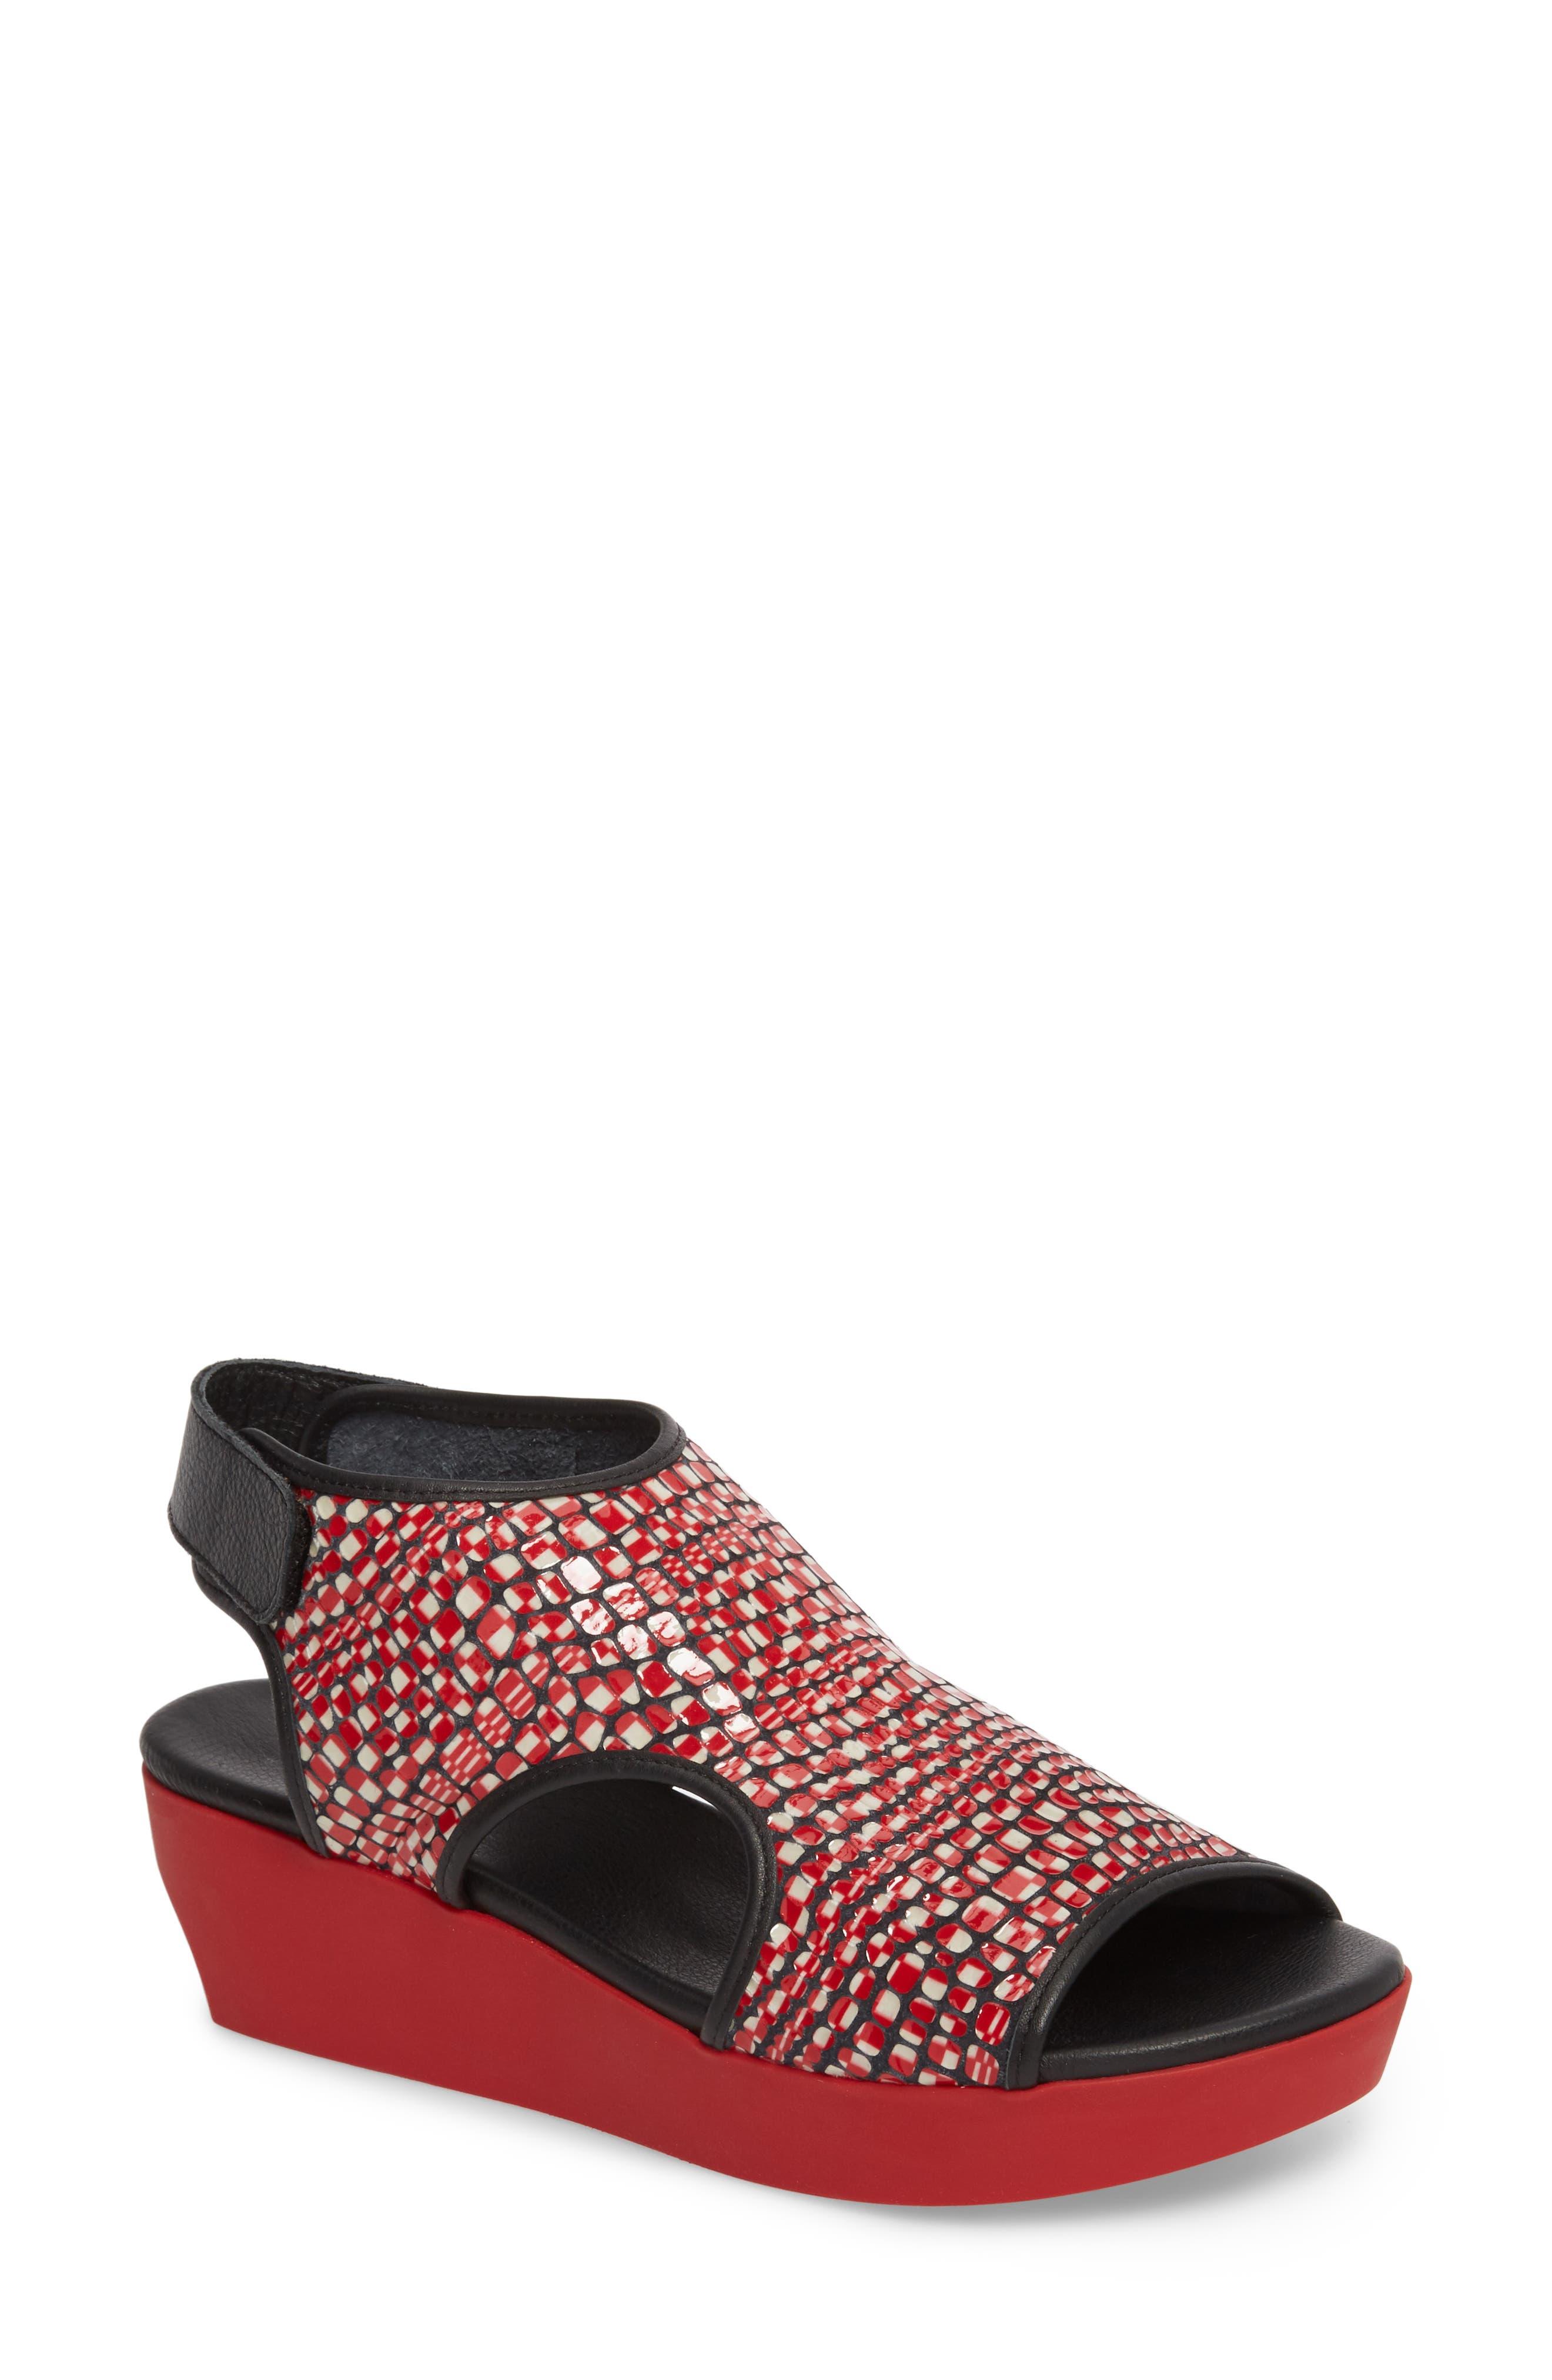 Naka Popa Wedge Sandal,                             Main thumbnail 1, color,                             Noir/ Rosso Leather